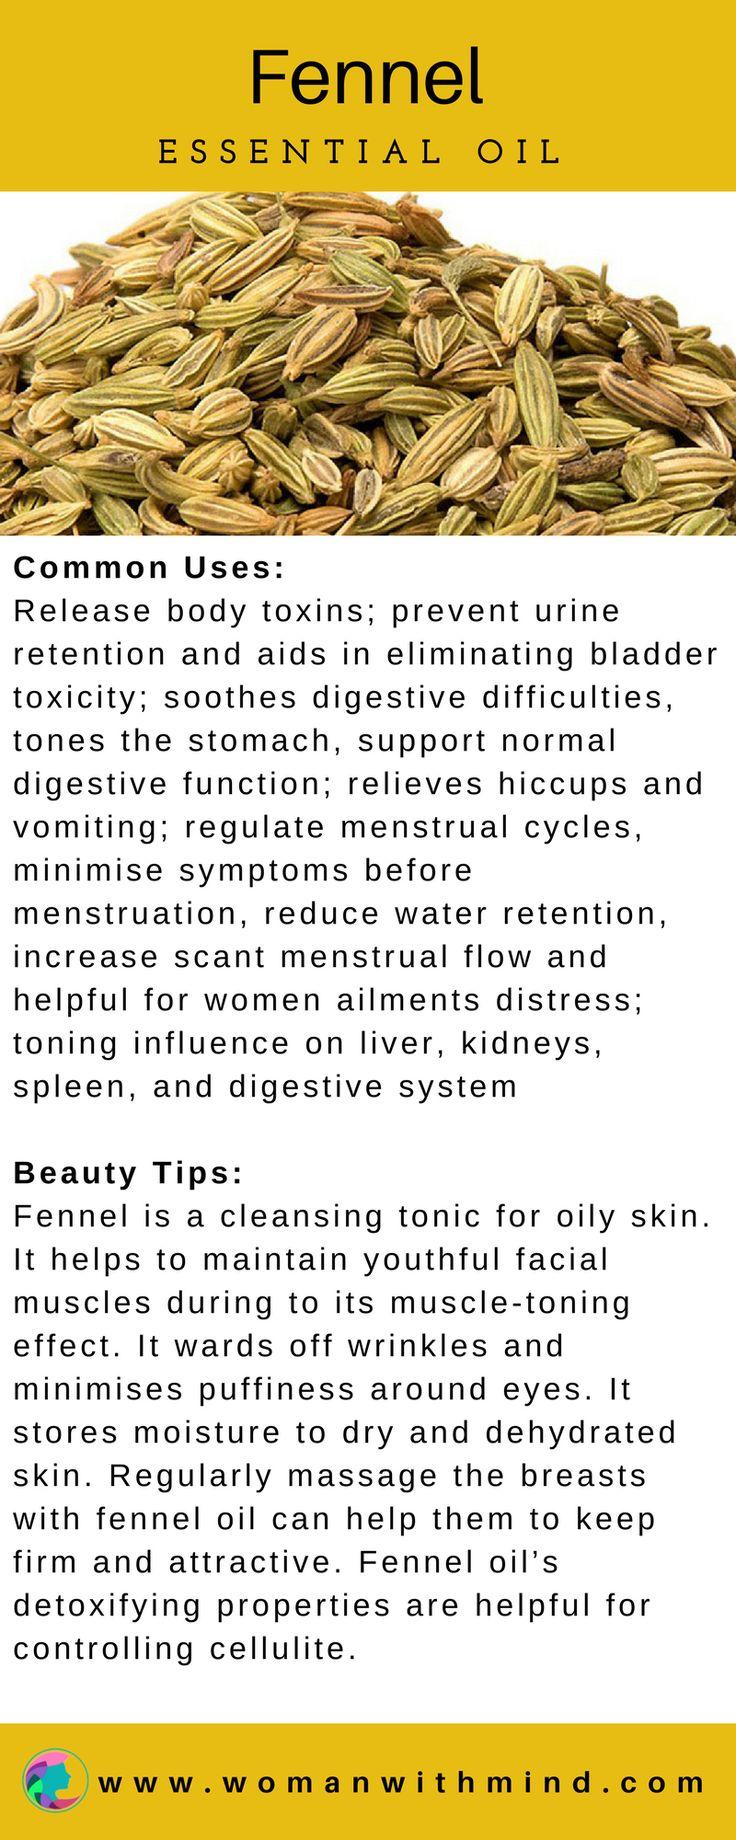 Fennel Essential Oil Guide & Application #essentialoils #diybeauty